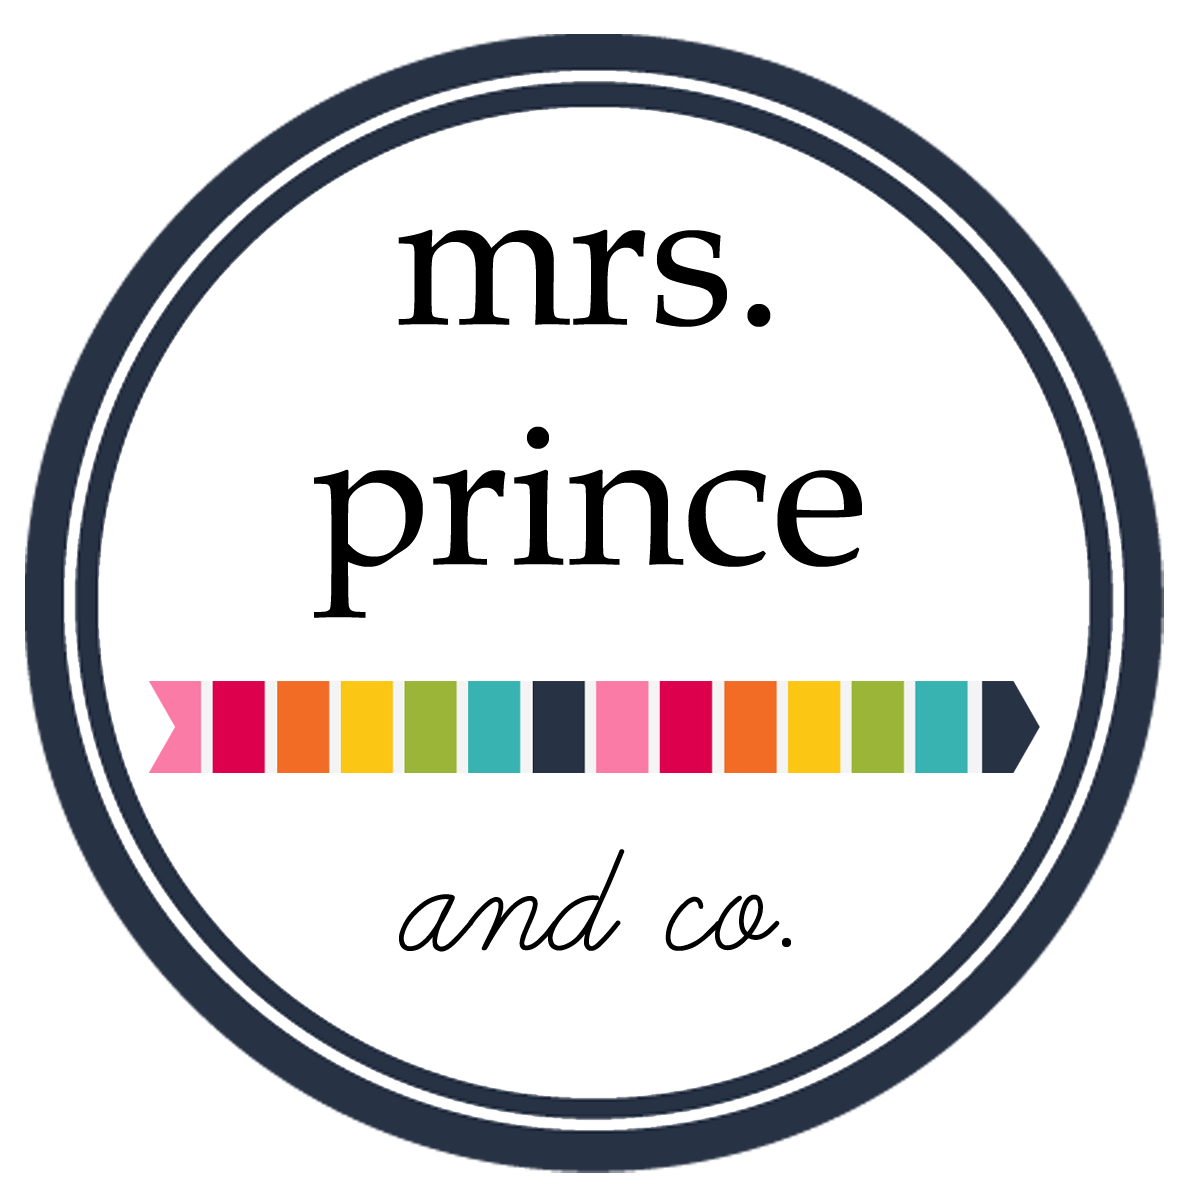 http://www.teacherspayteachers.com/Store/Leanne-Prince